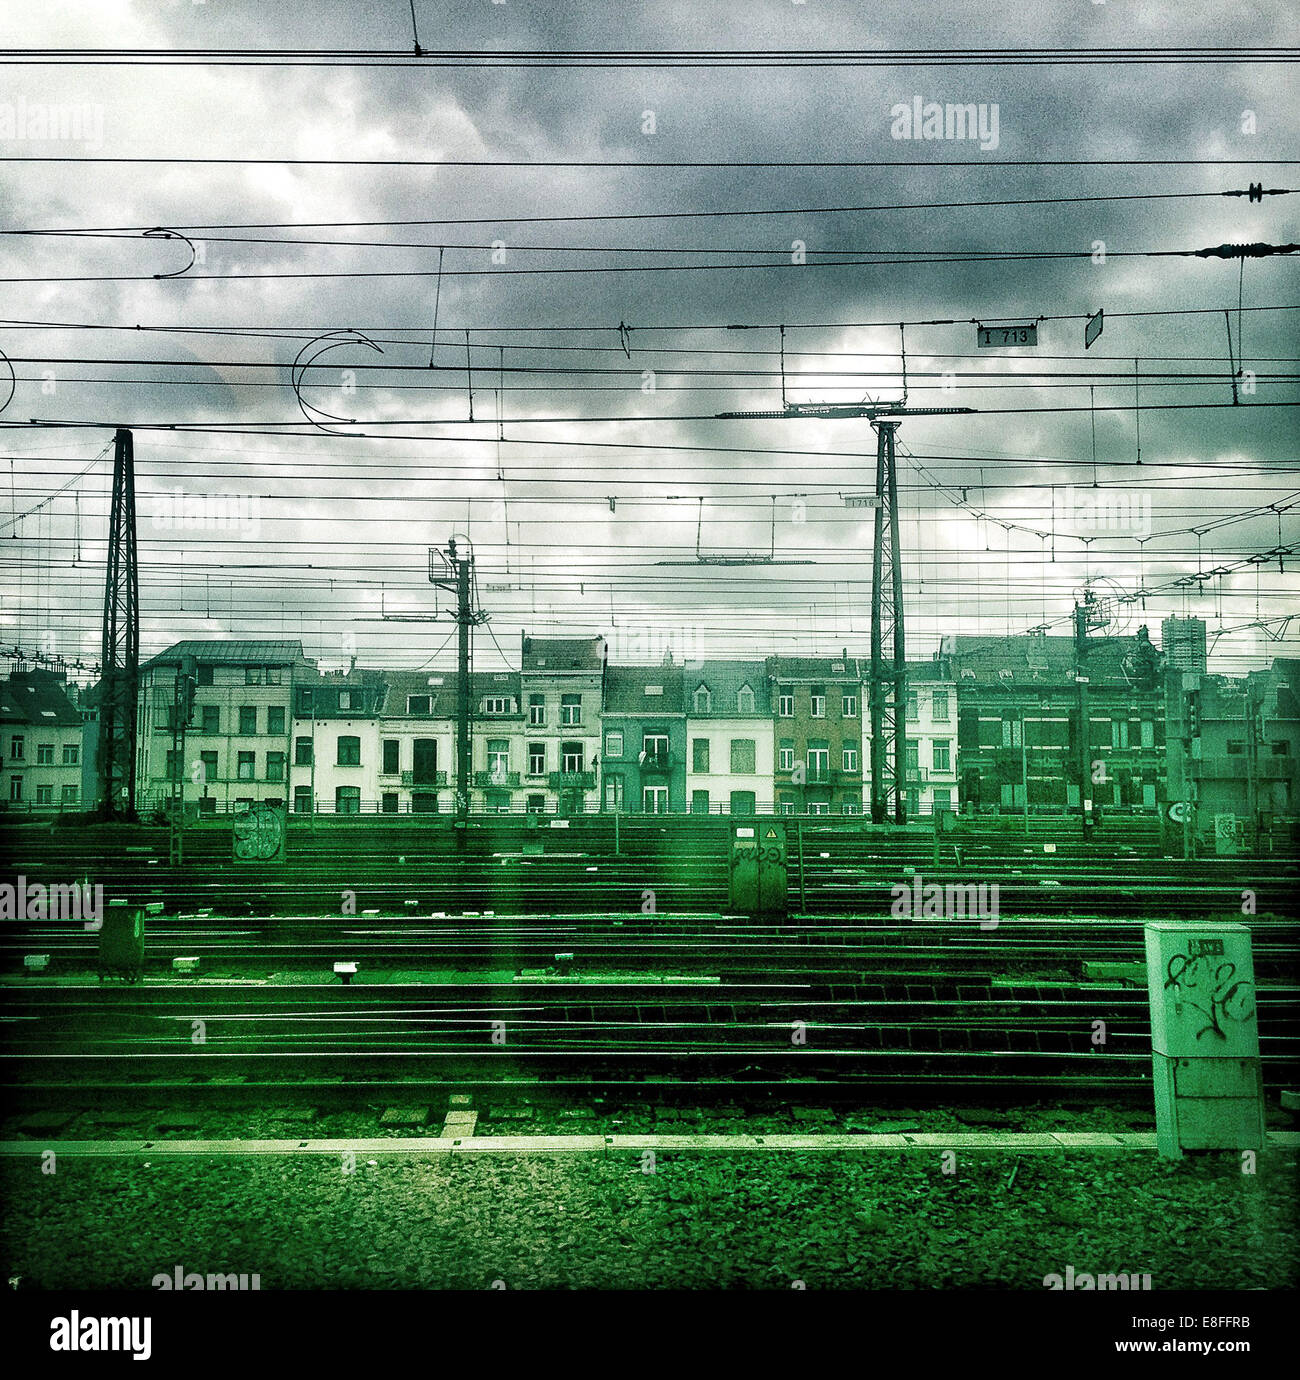 Eisenbahn durch Stadt Stockbild